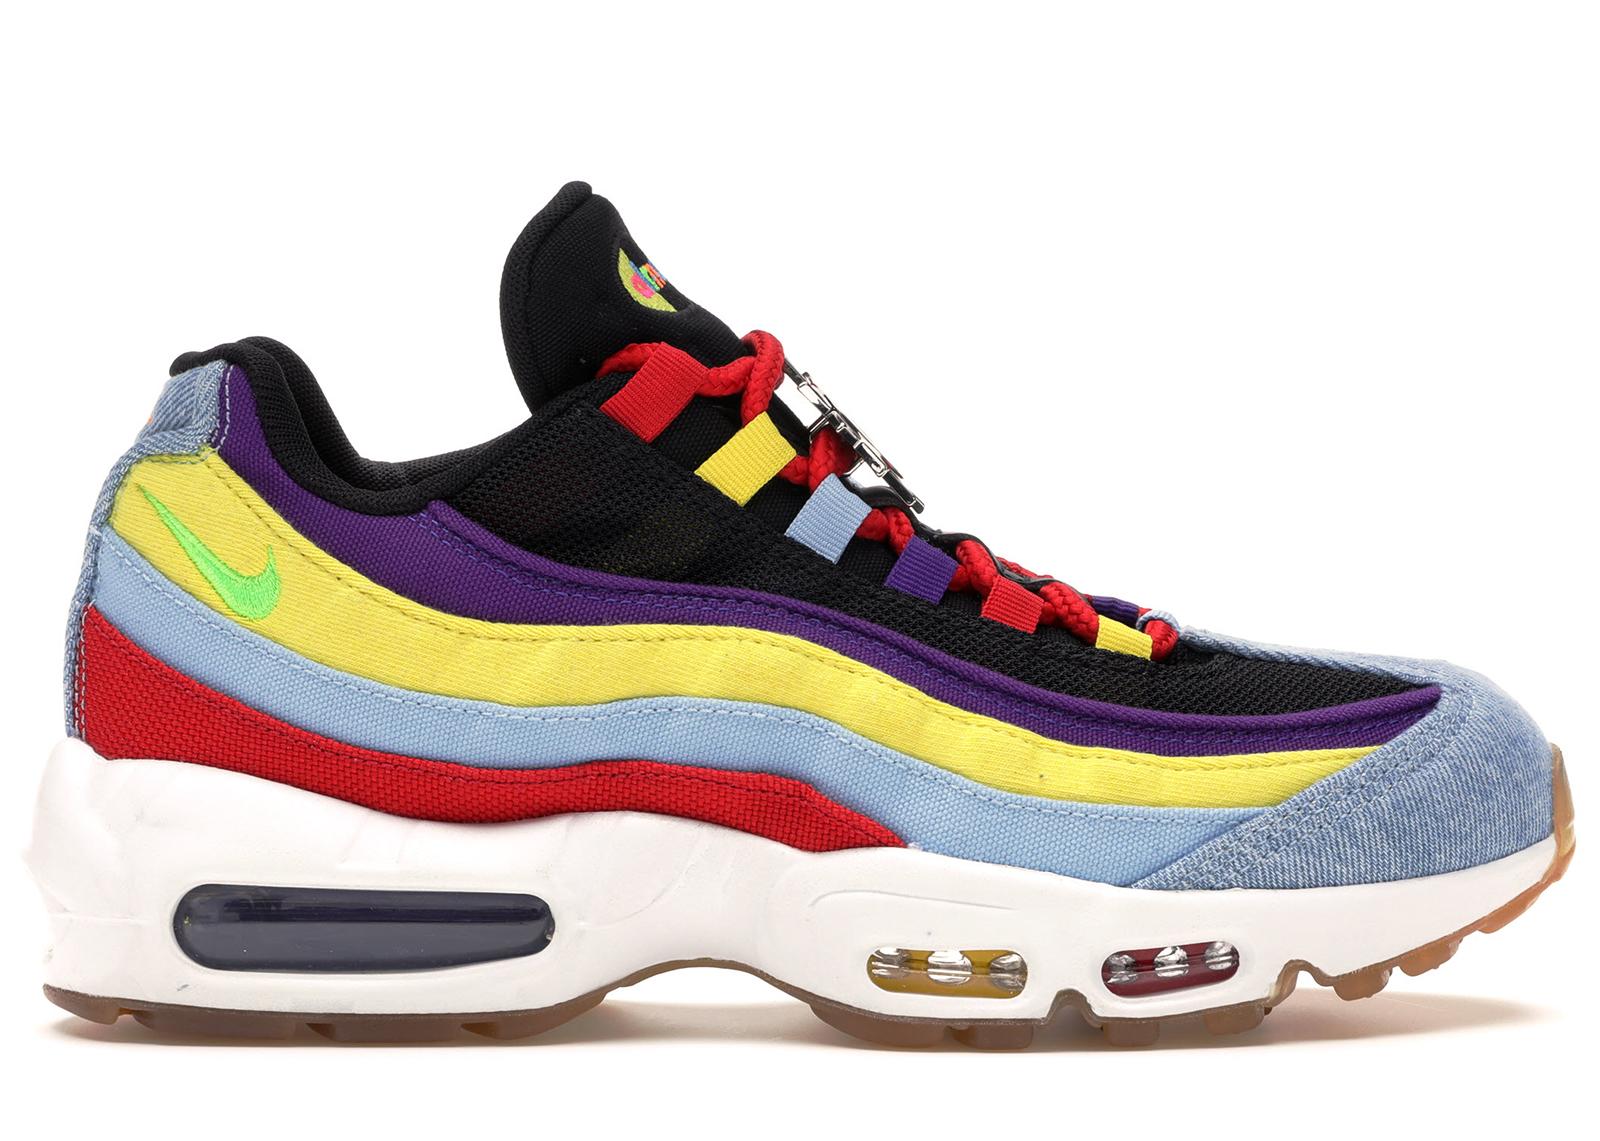 Nike Air Max 95 SP Multicolor - CK5669-400